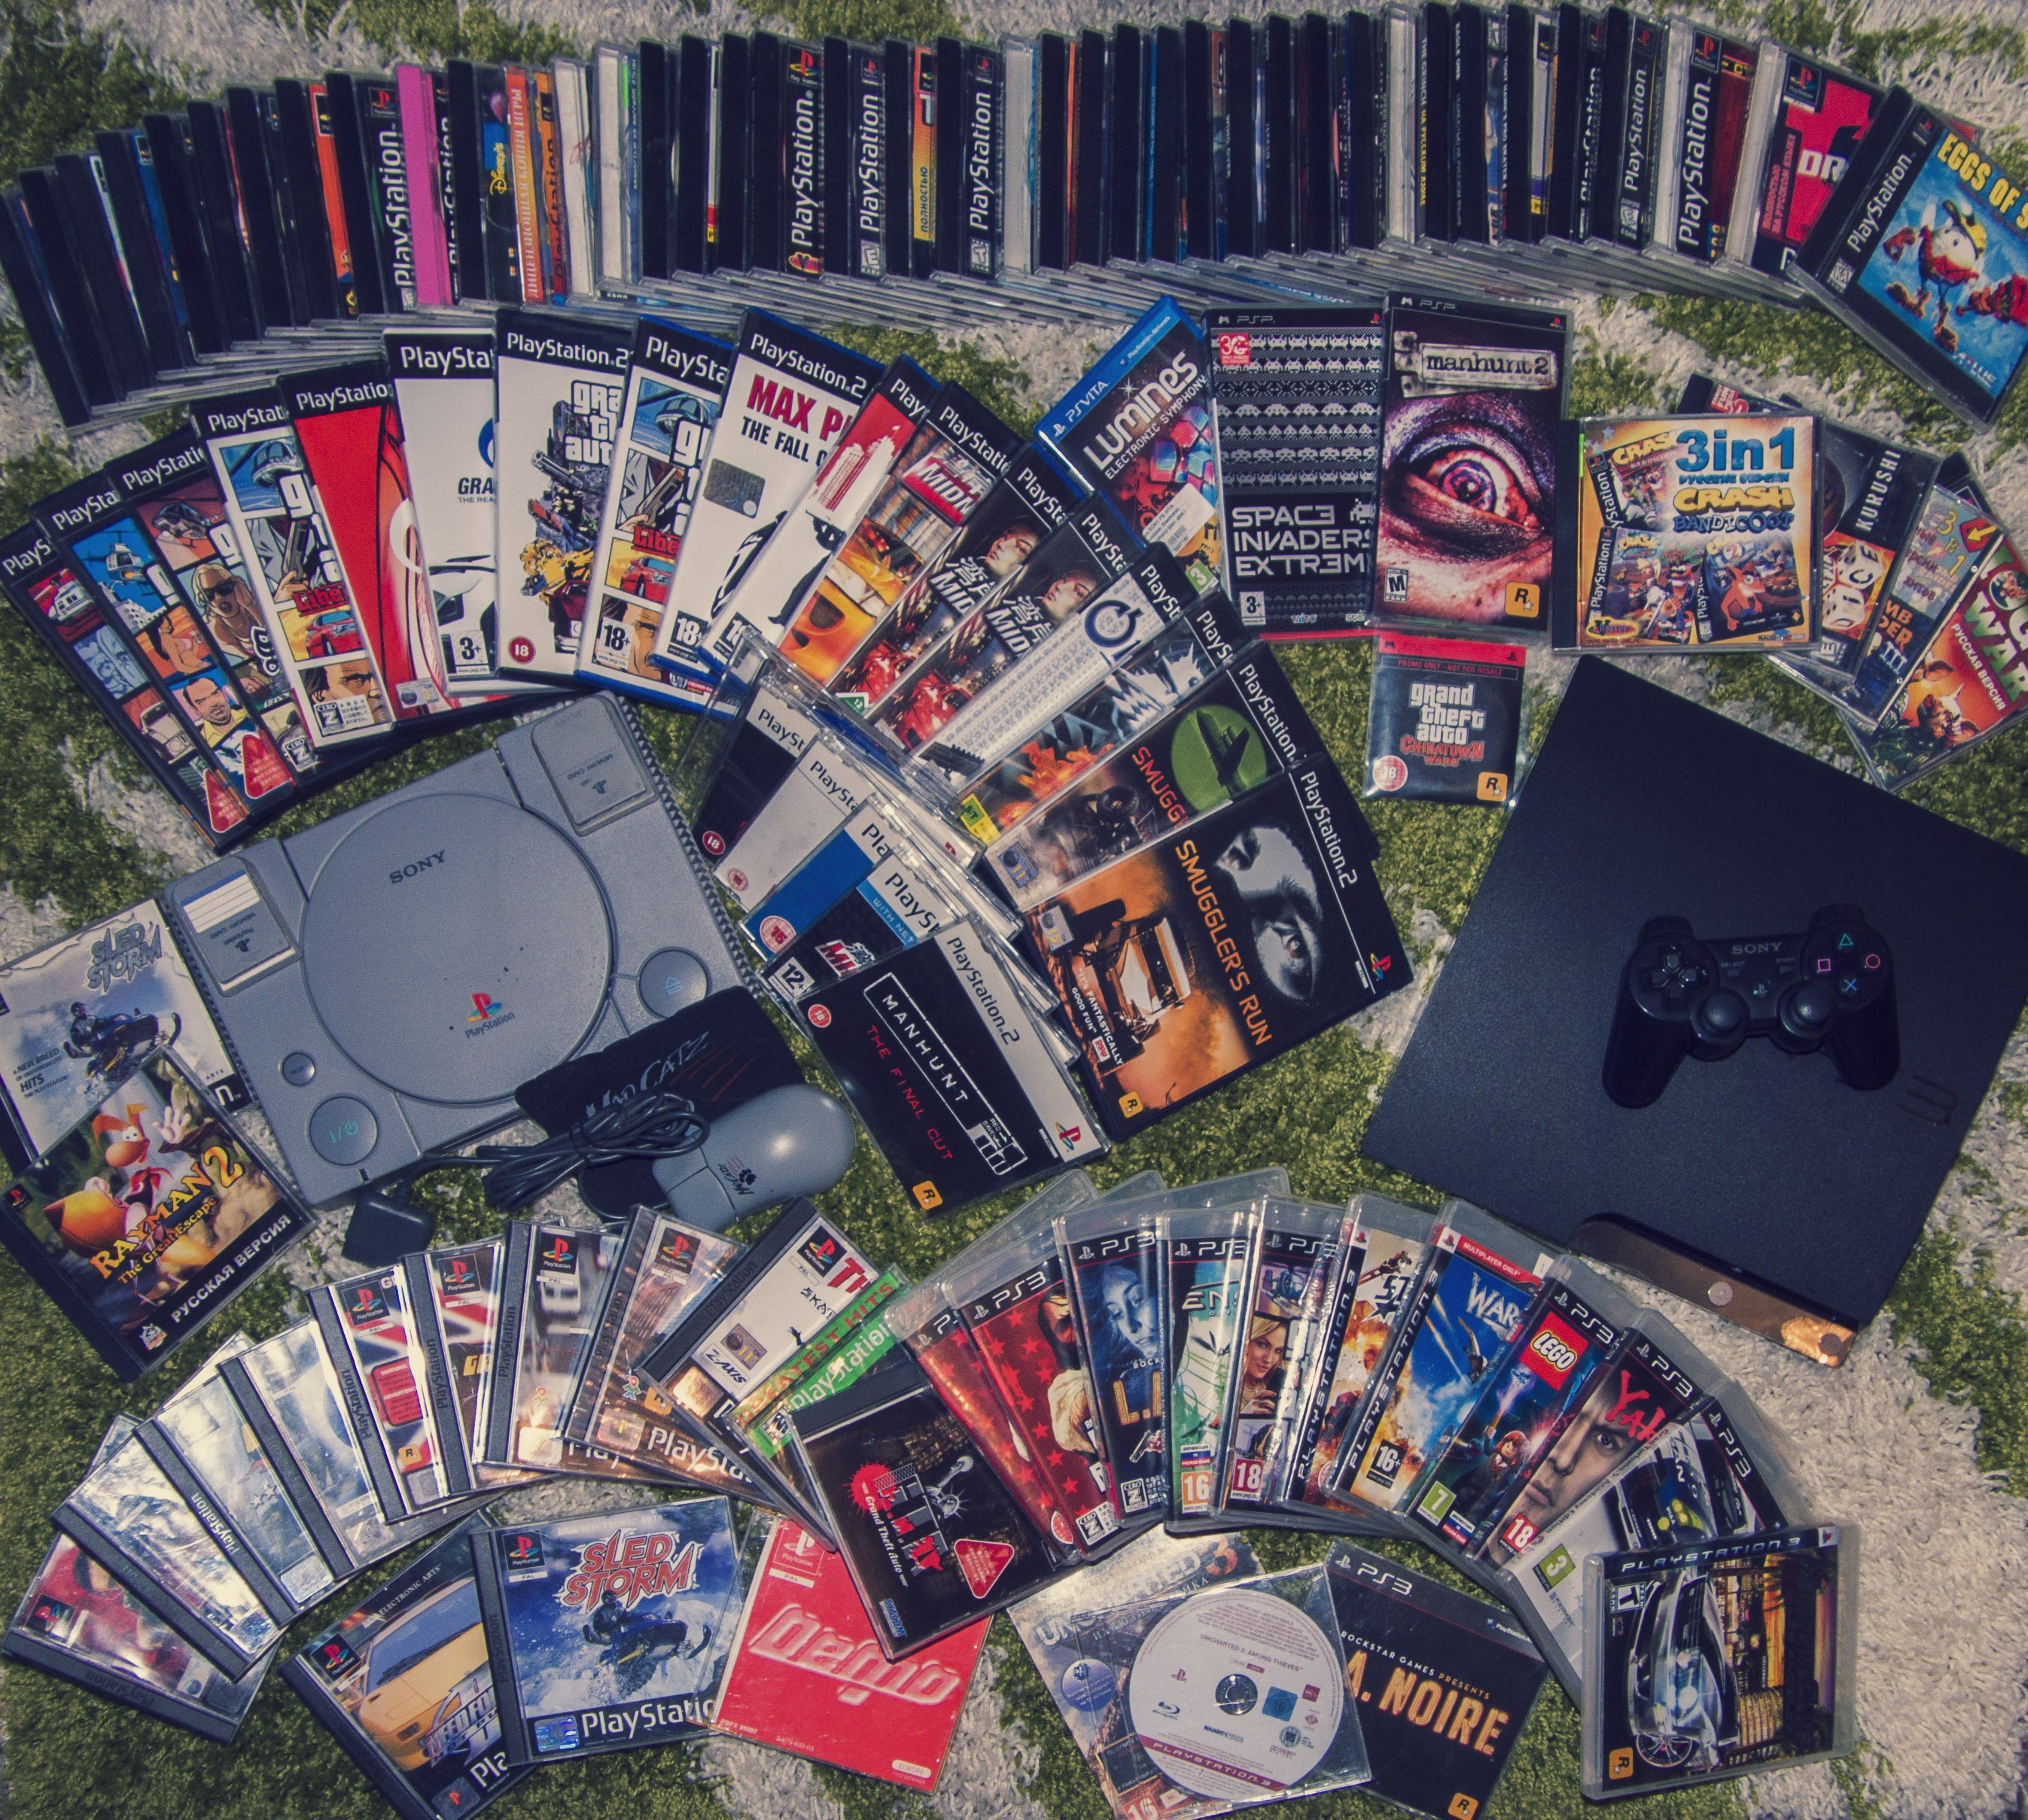 Playstation для ребенка, Playstation 3 для юноши - Изображение 2